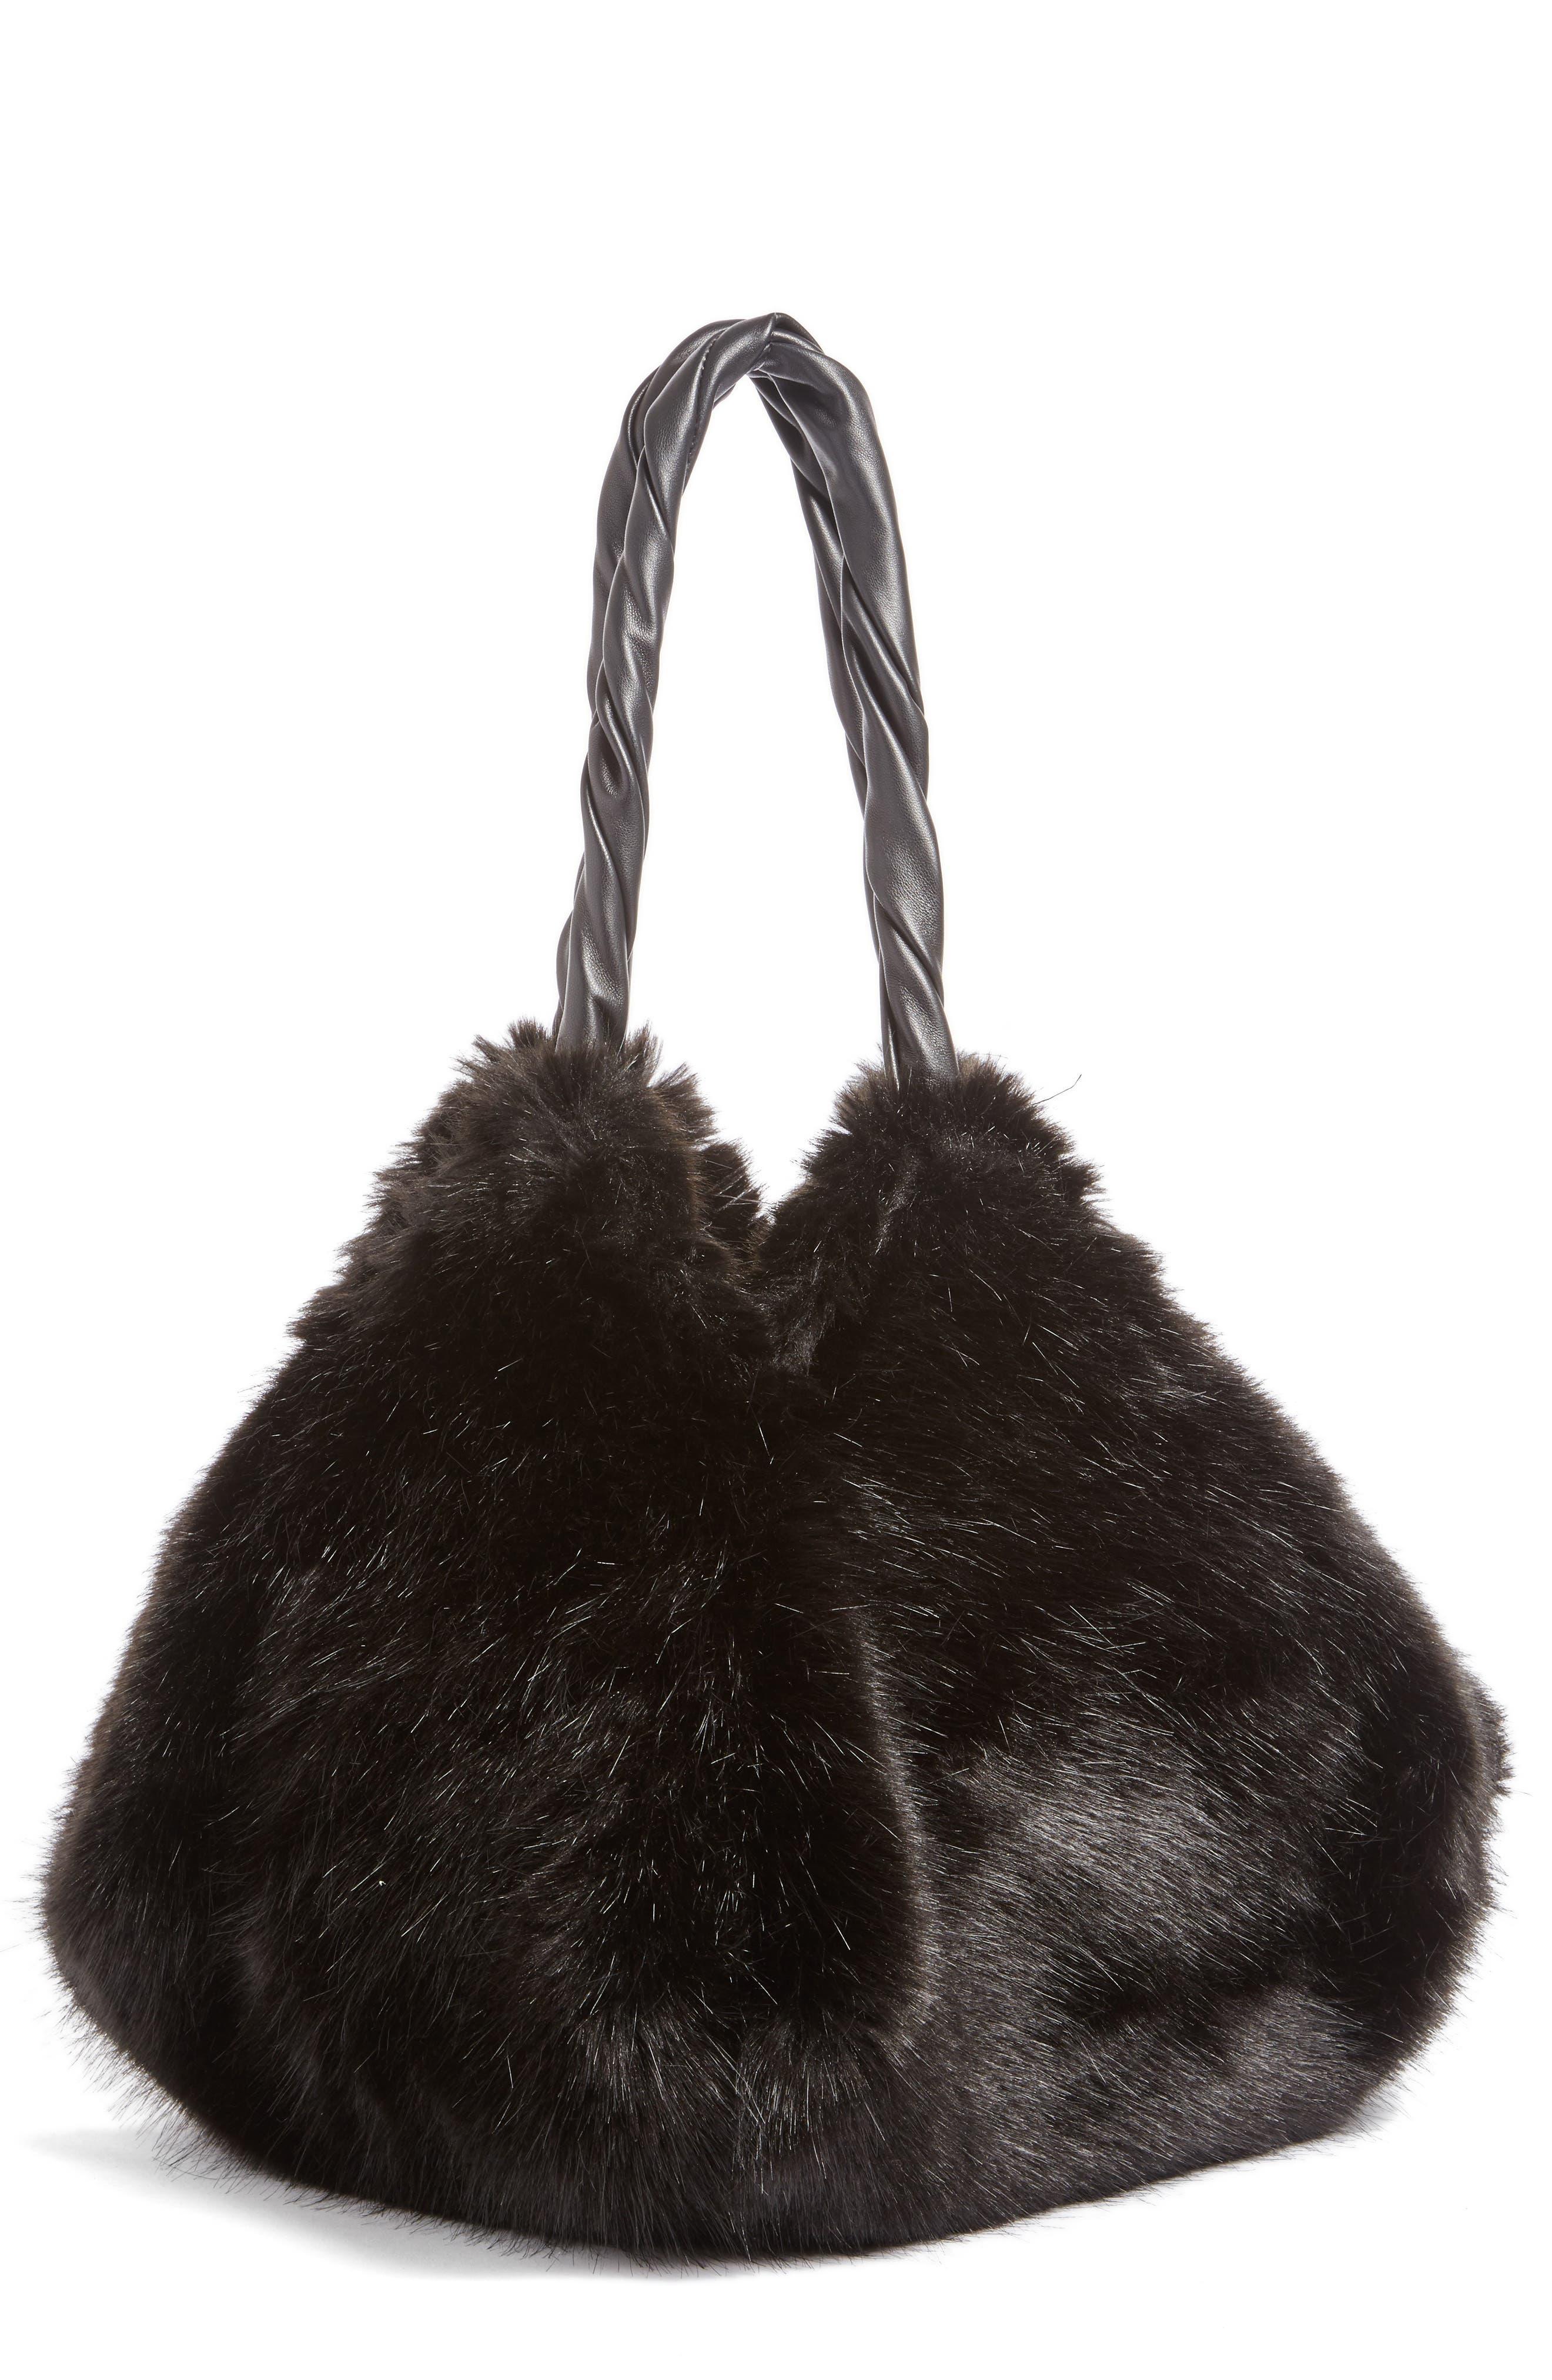 Pyramid Faux Fur Shoulder Bag,                             Main thumbnail 1, color,                             001